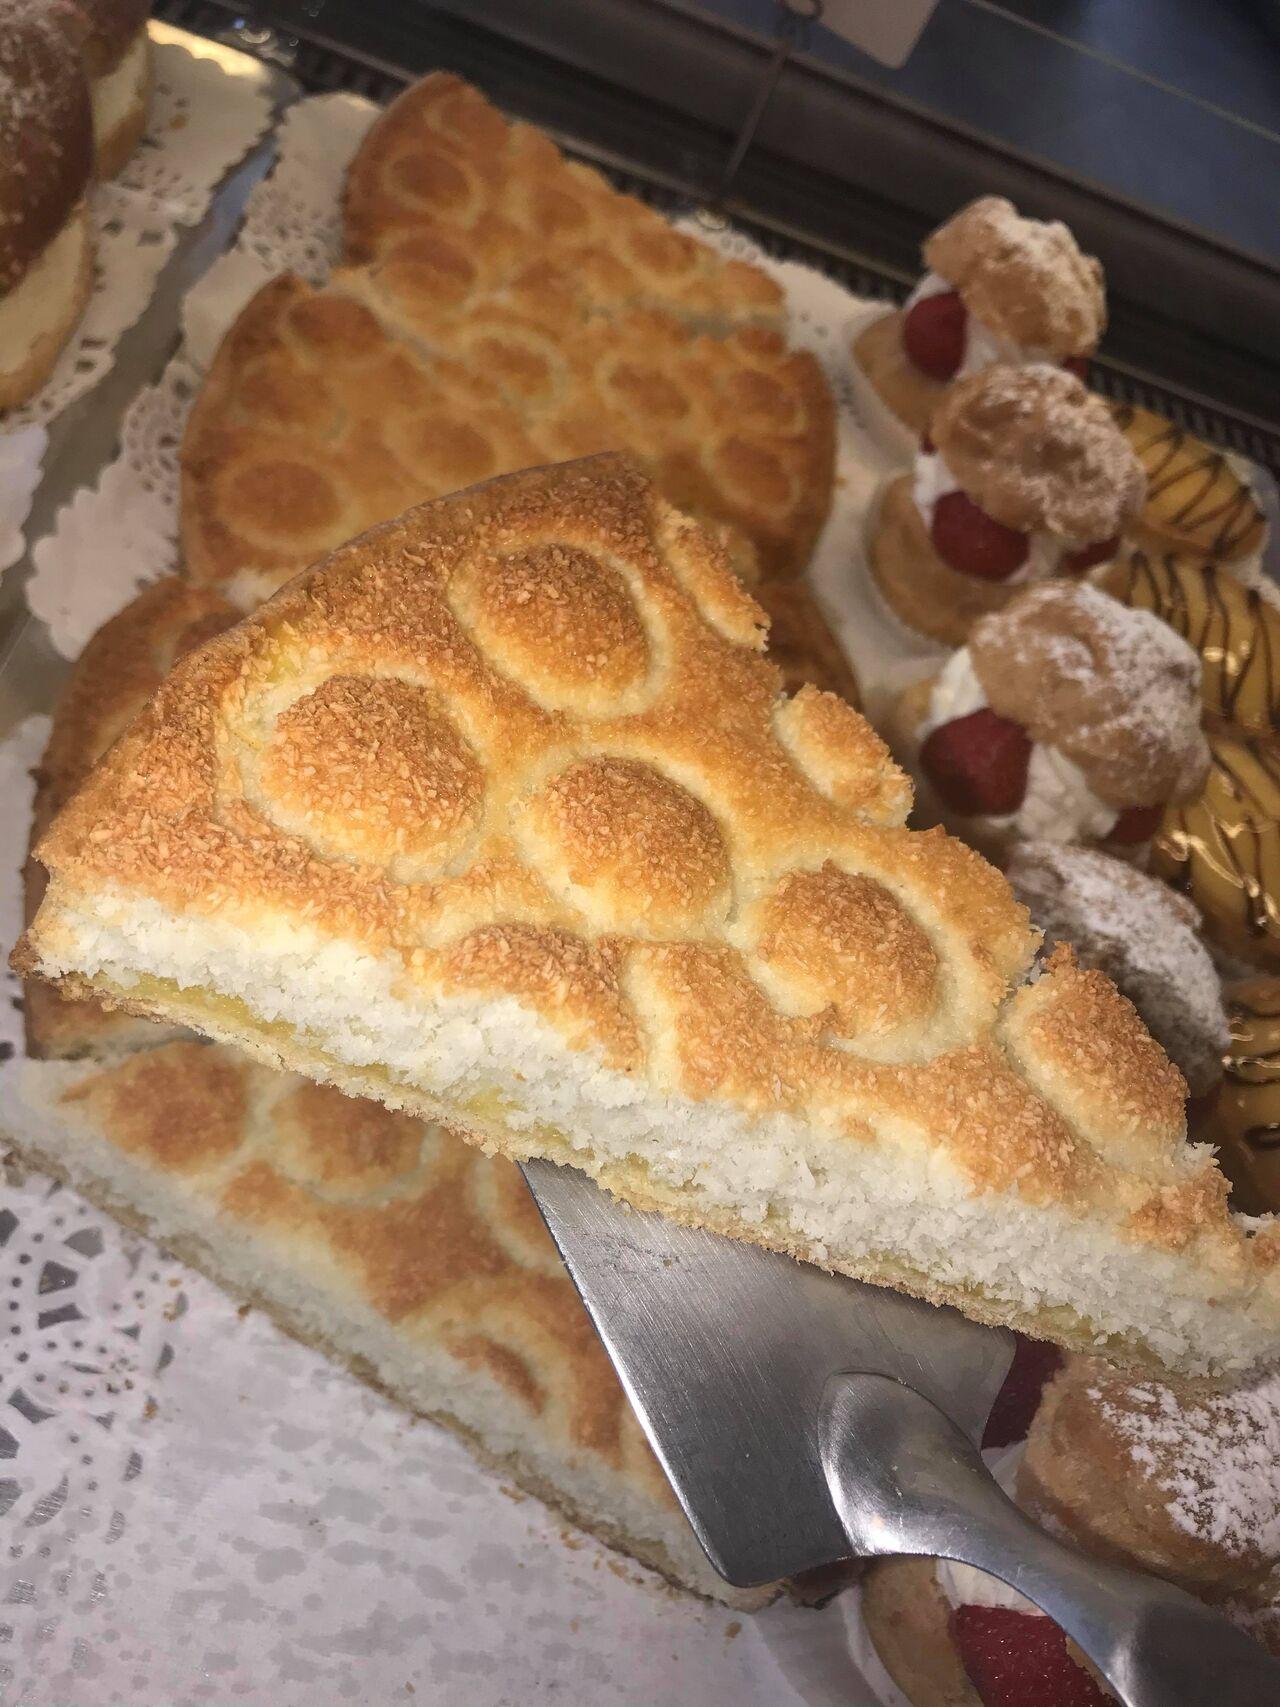 Boulangerie Pâtisserie L'Epi d'Or - Cannes French cuisine near me Book now